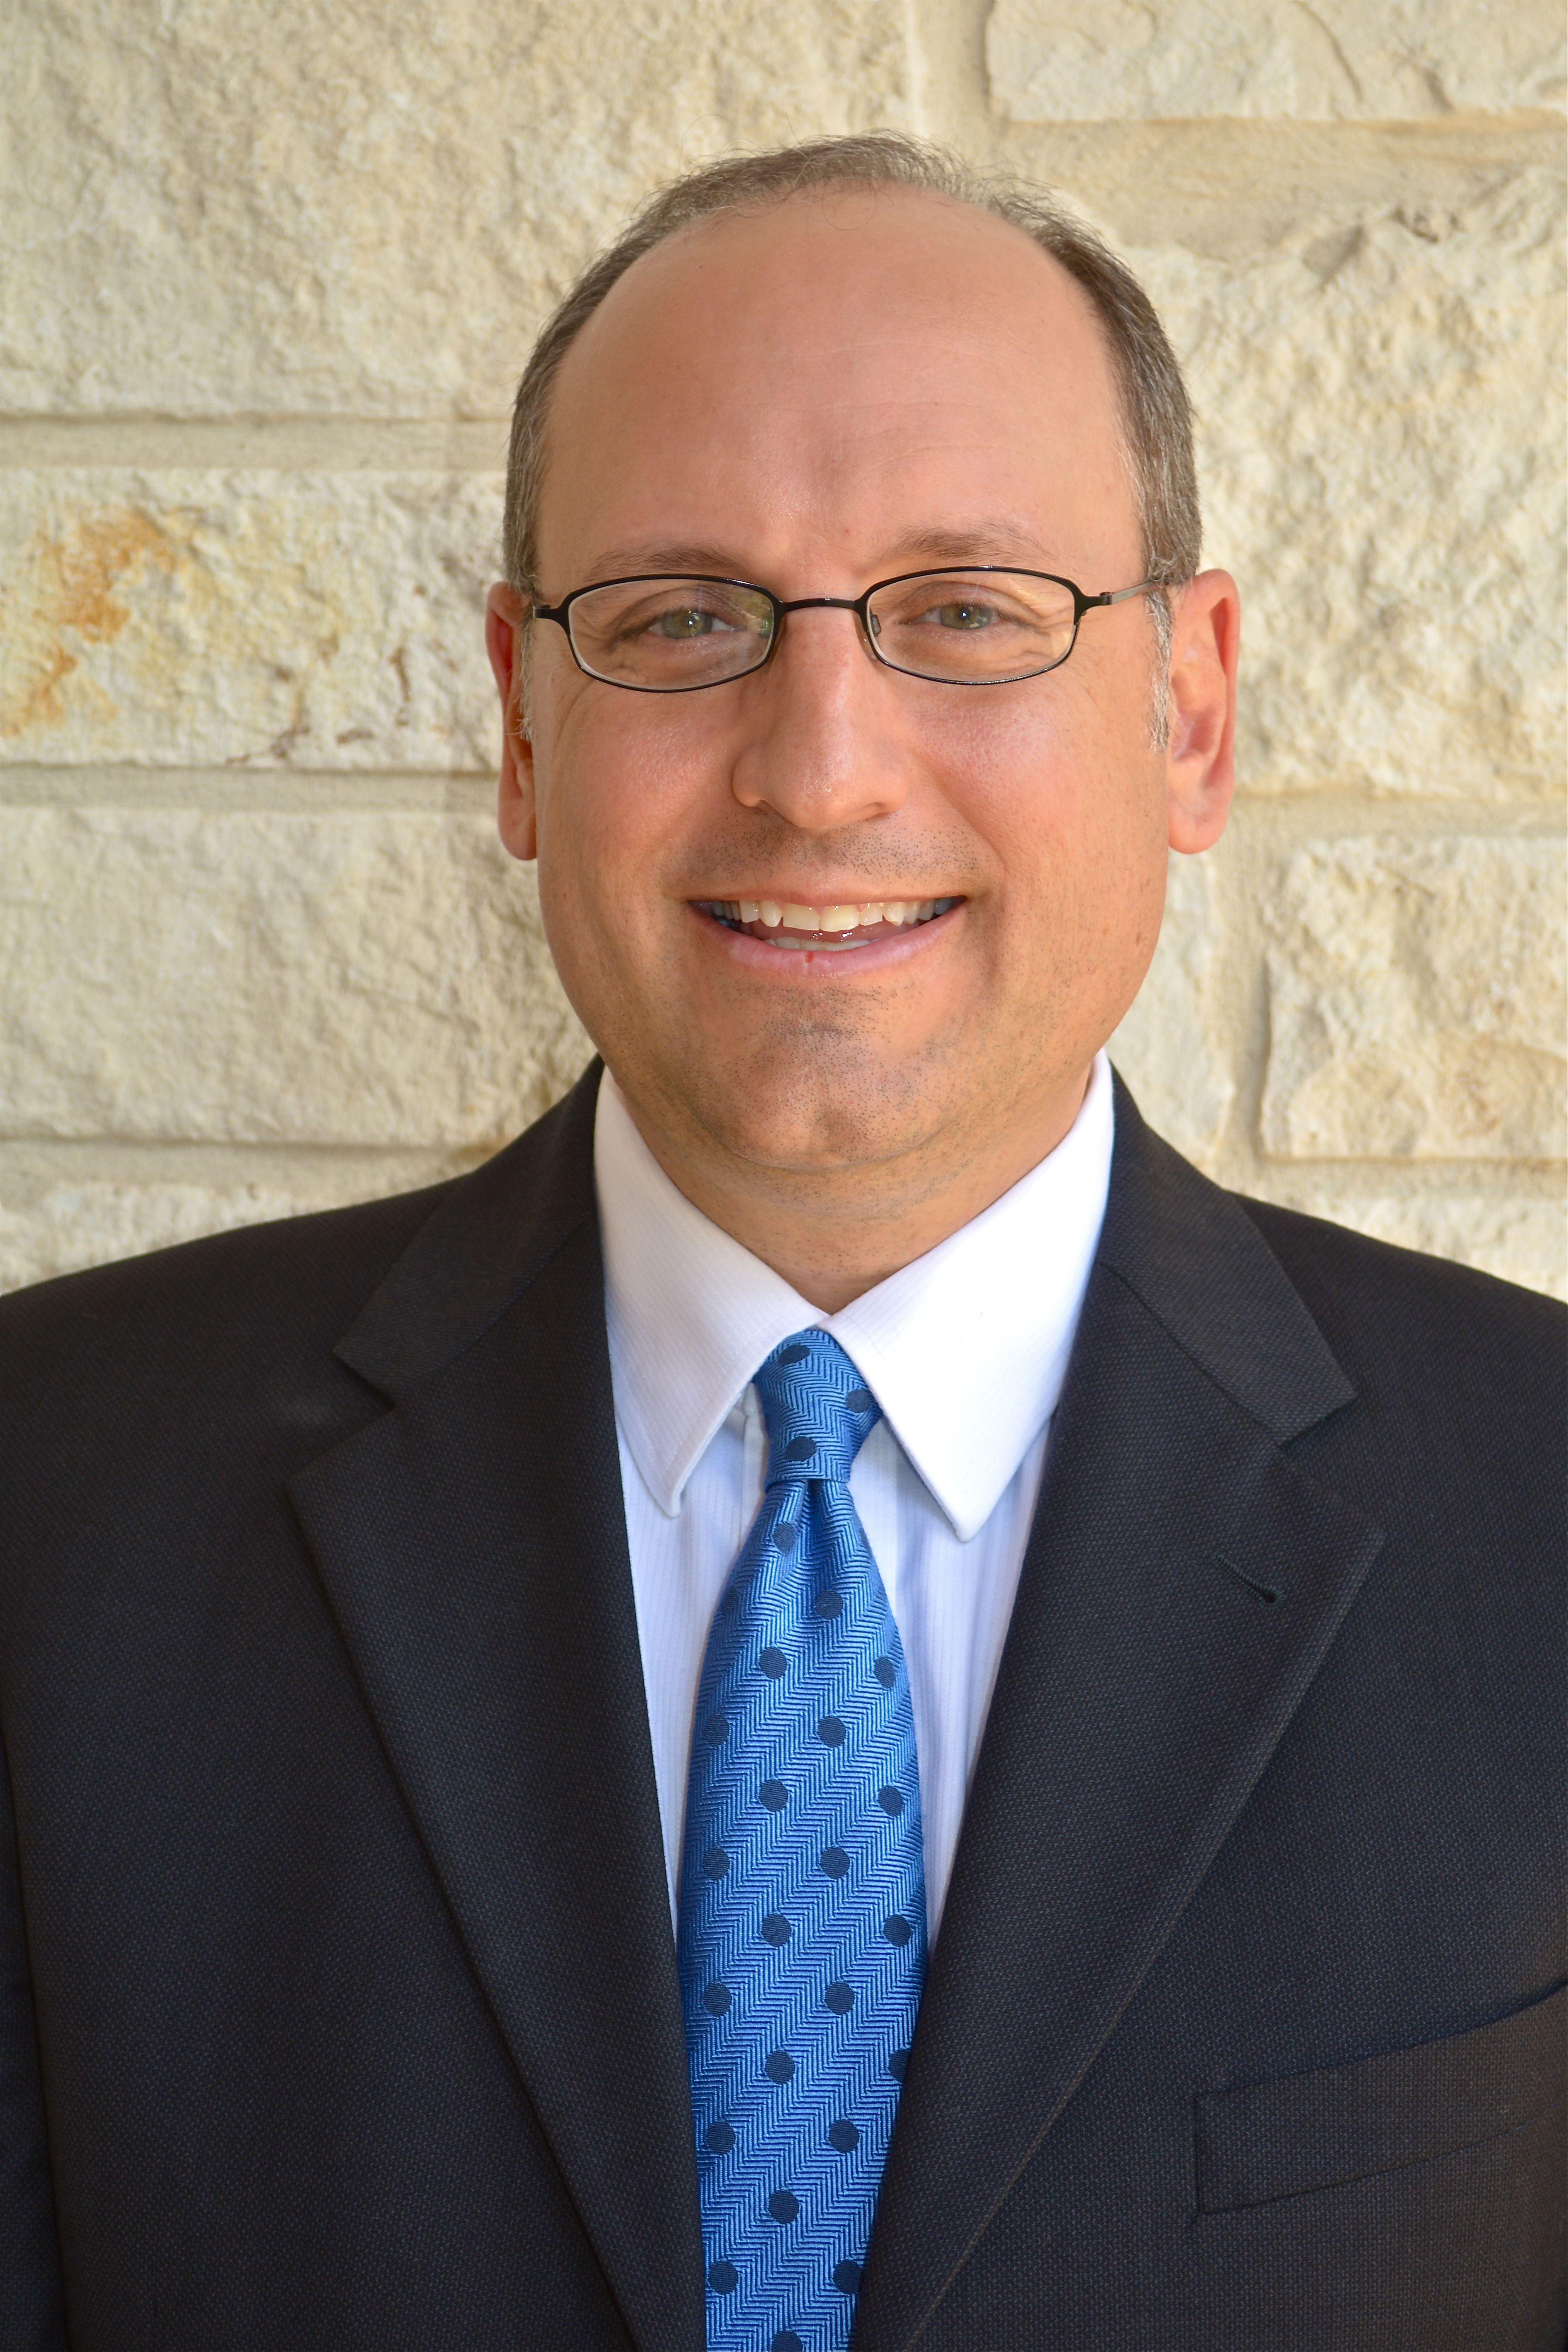 Matthew G. Retzlof, M.D., FACOG